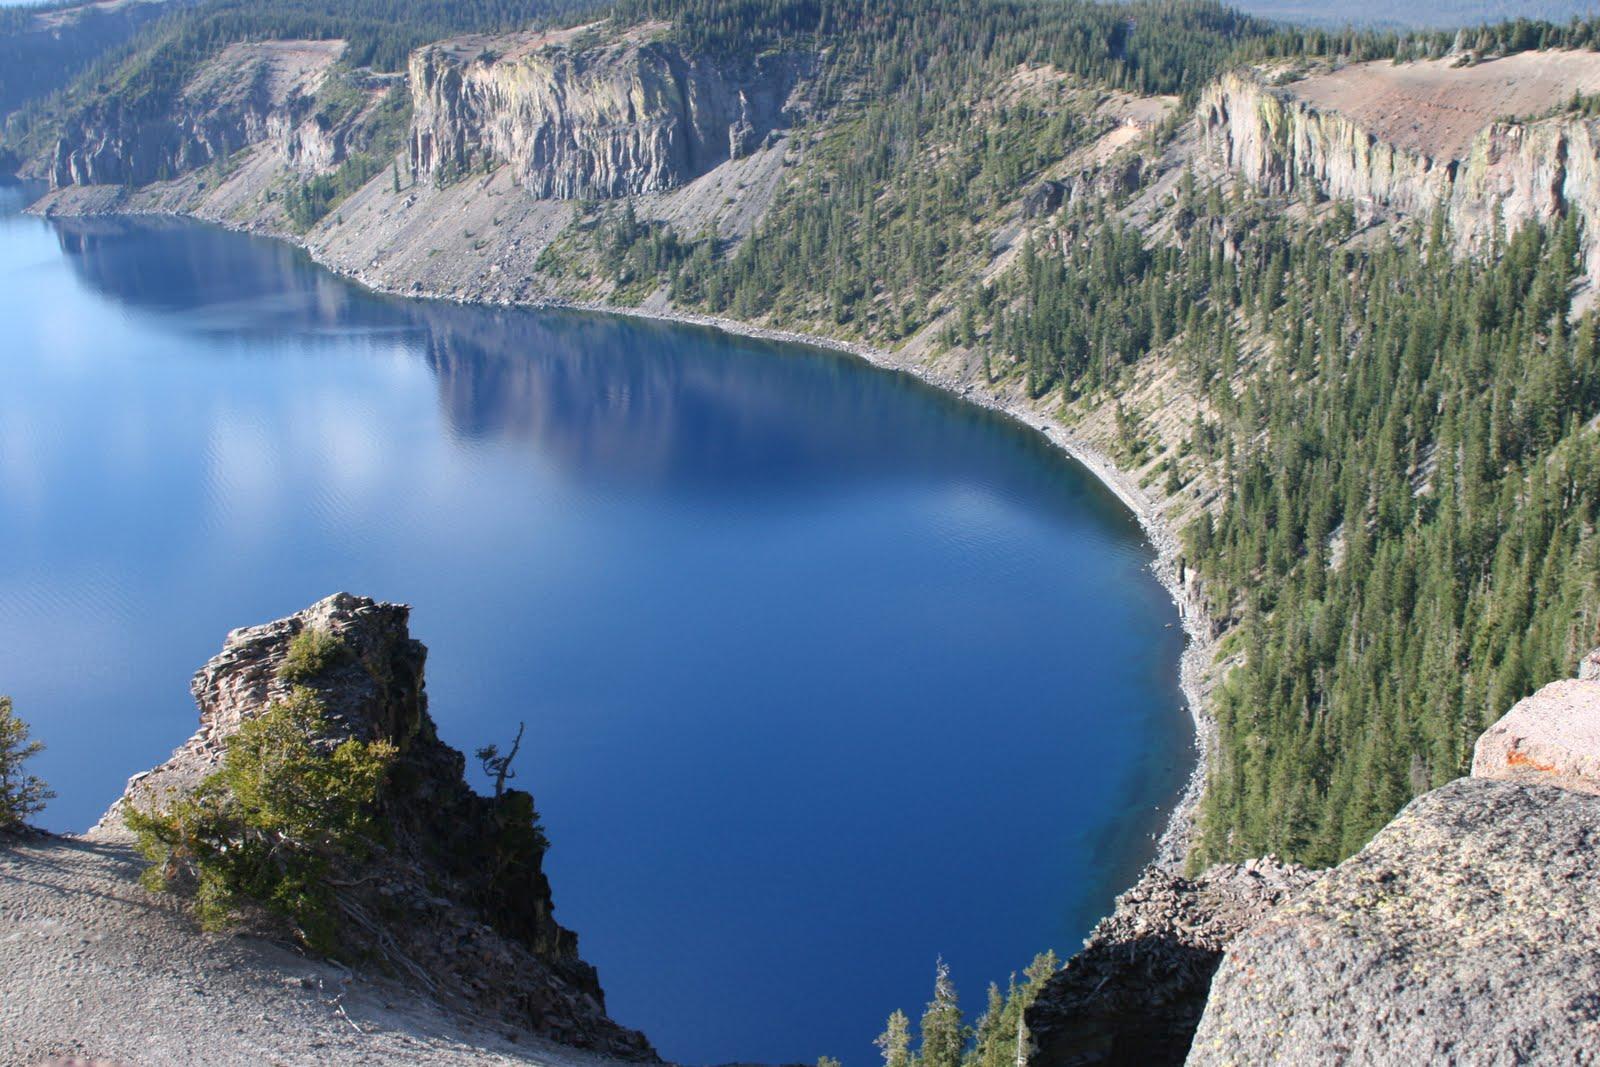 [Crater+Lake+National+Park+(56).JPG]